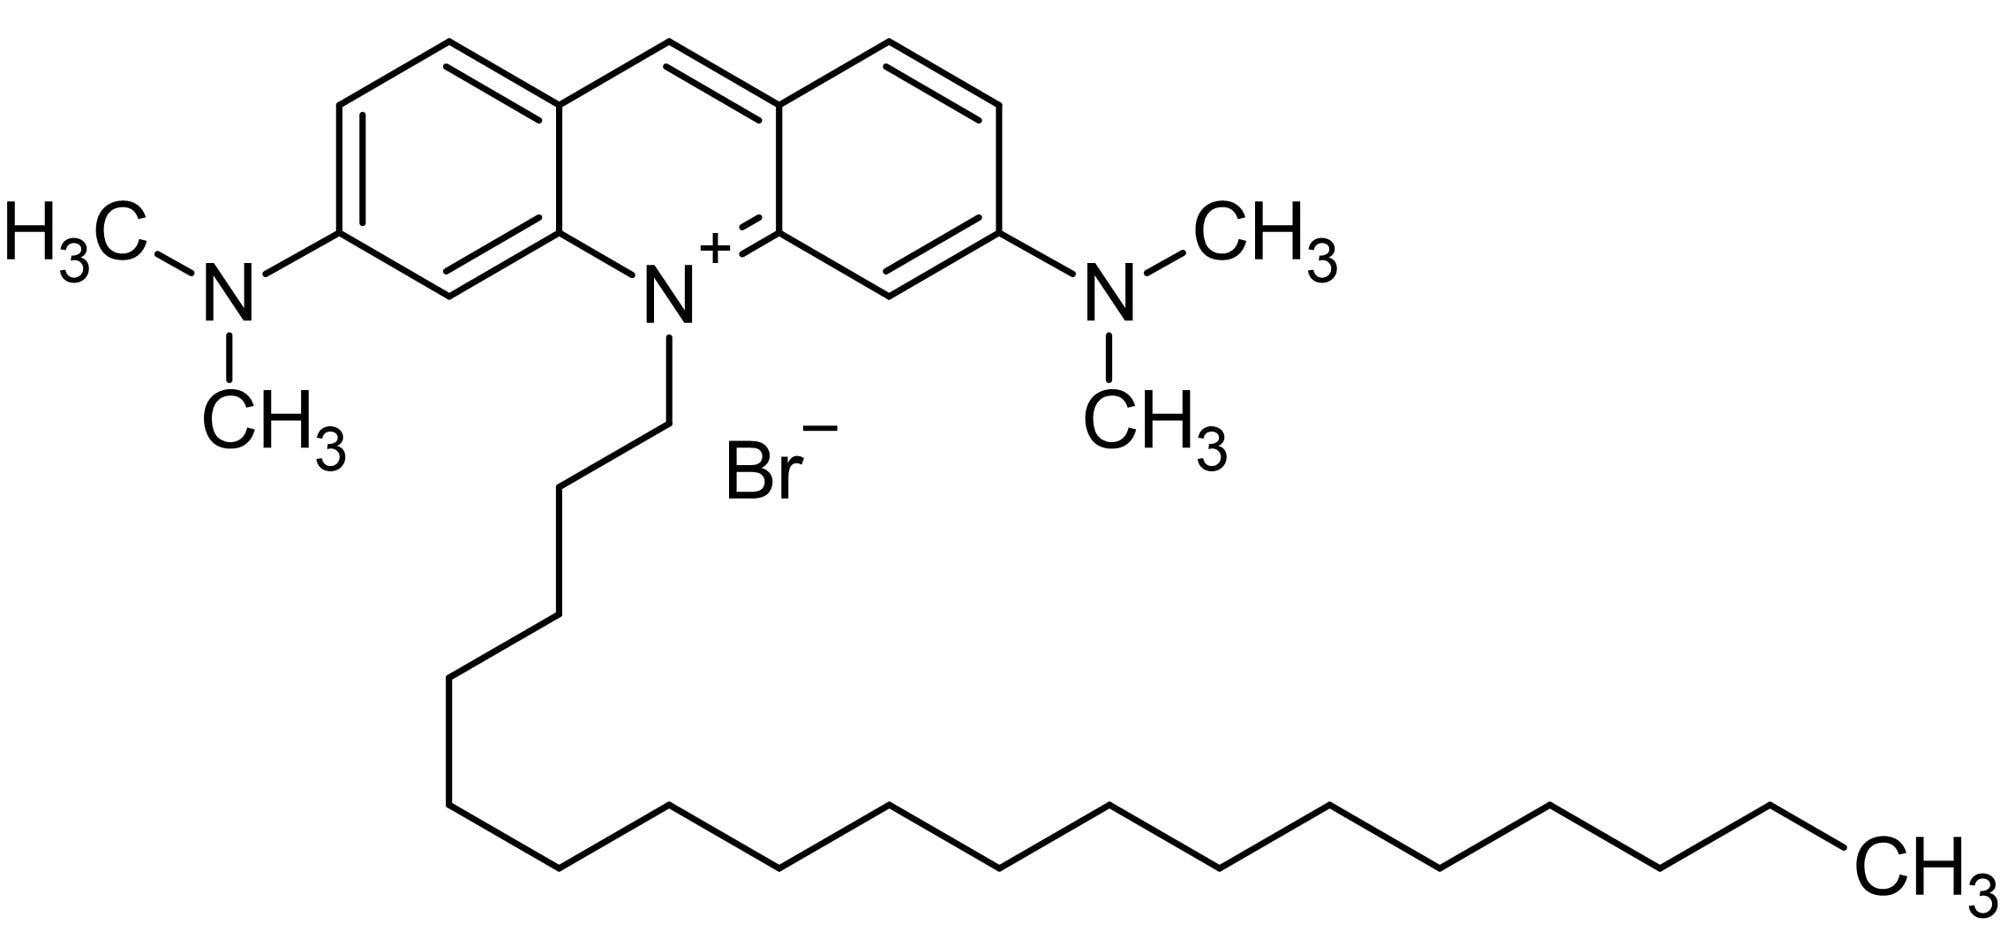 Chemical Structure - 10-Octadecylacridine orange bromide, Fluorescent reagent (ab145469)